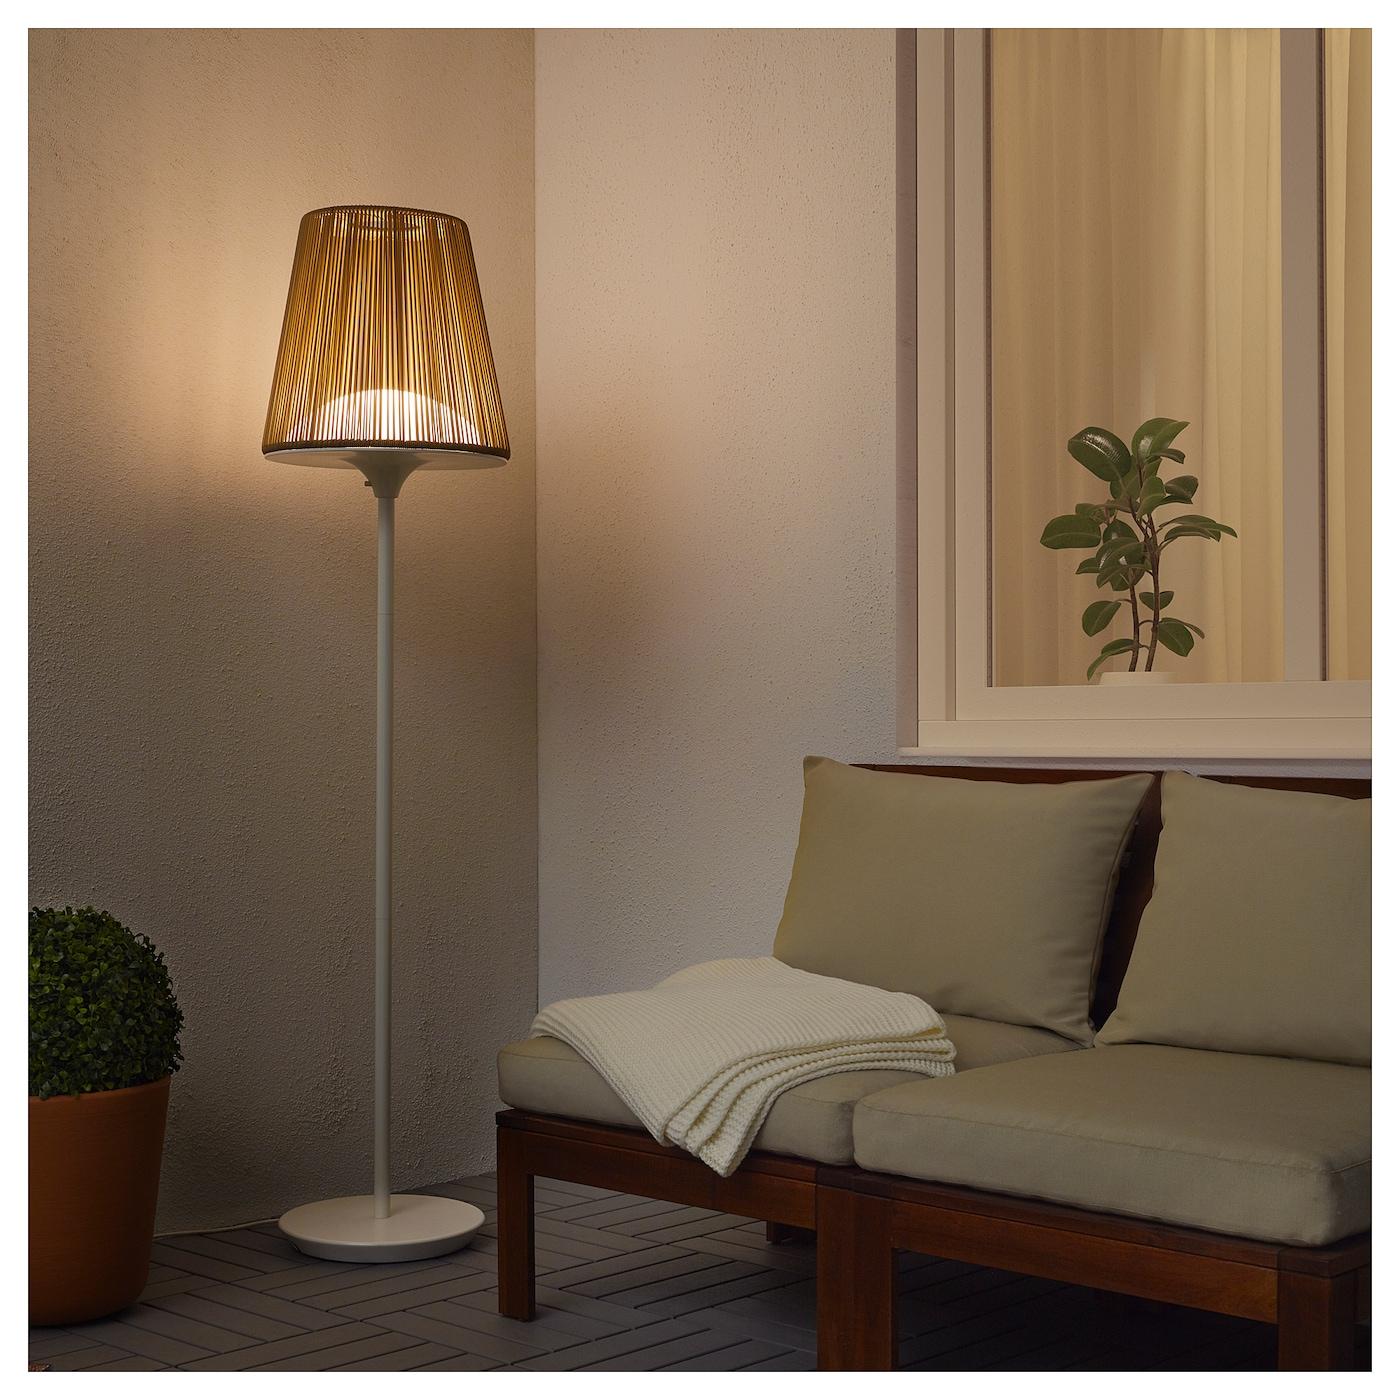 Ikea Mullbacka Floor Lamp